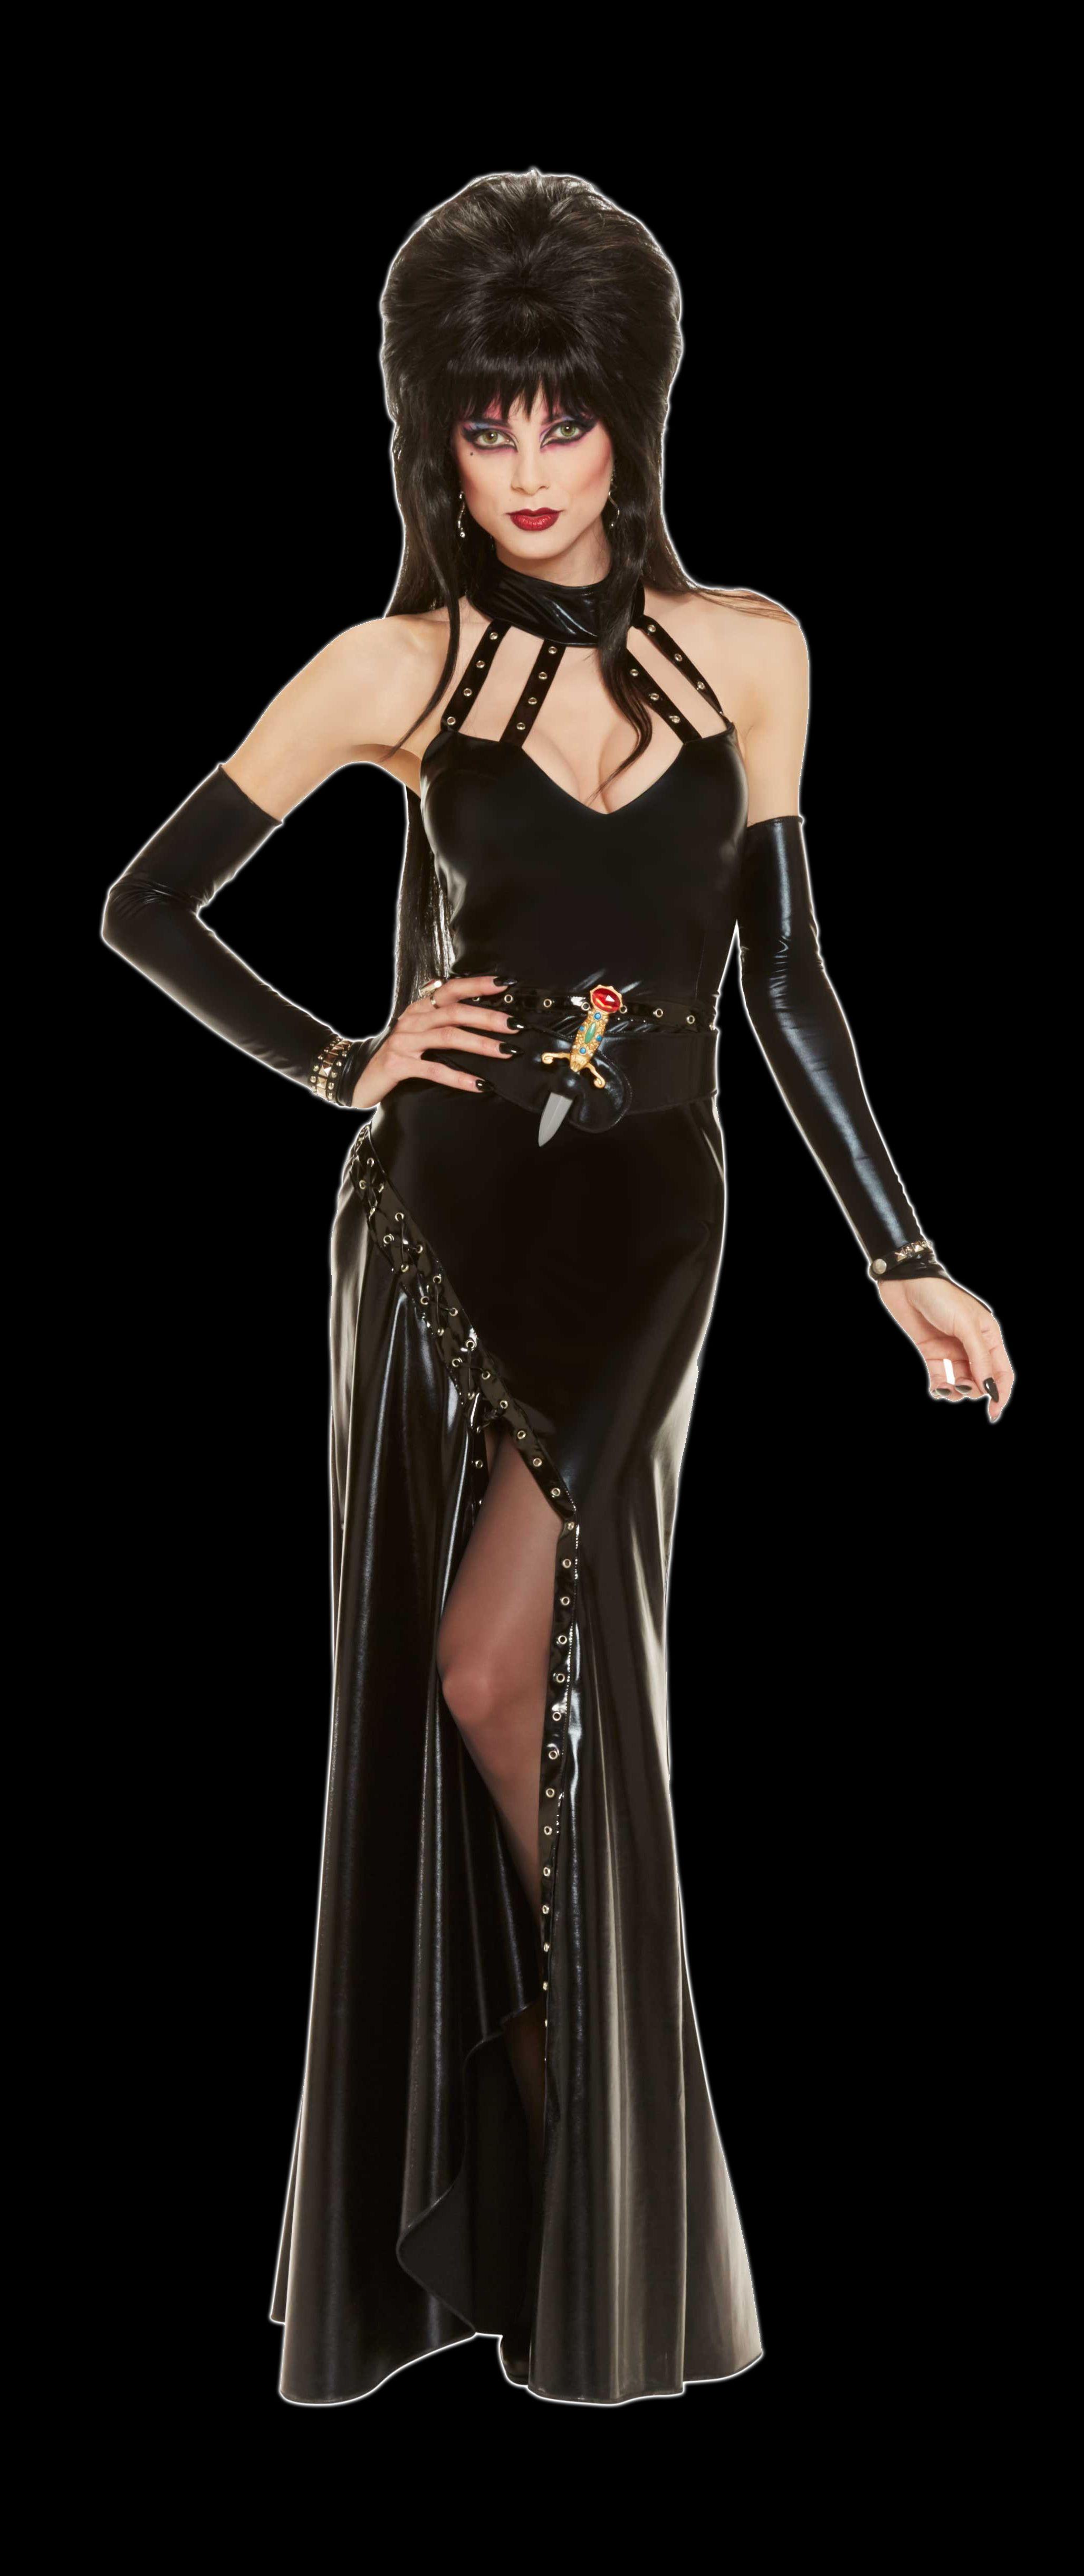 Mistress Elvira Costume Addams Family Black Tie Halloween